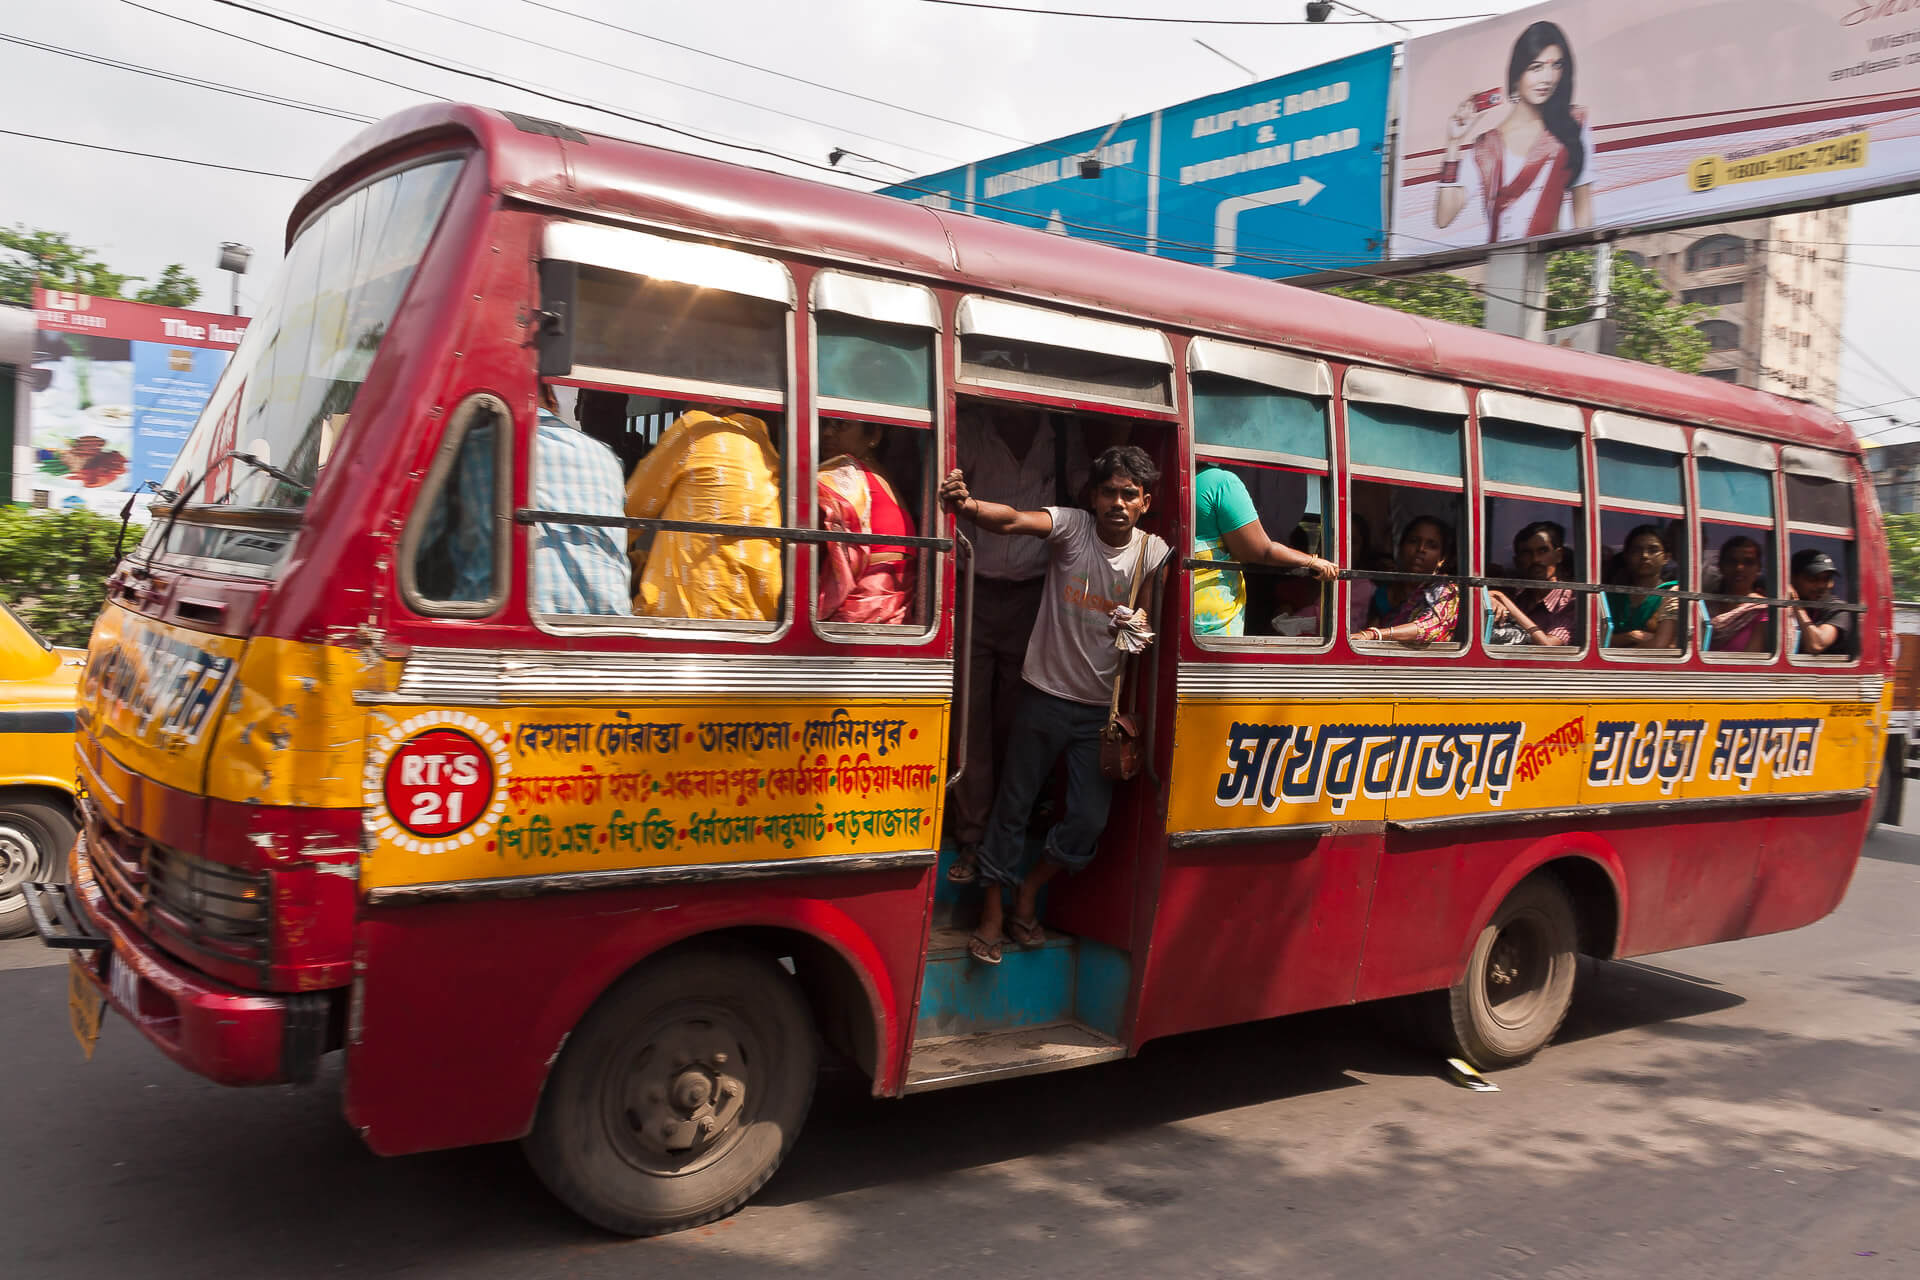 Bus I | Streetfotografie in Kalkutta